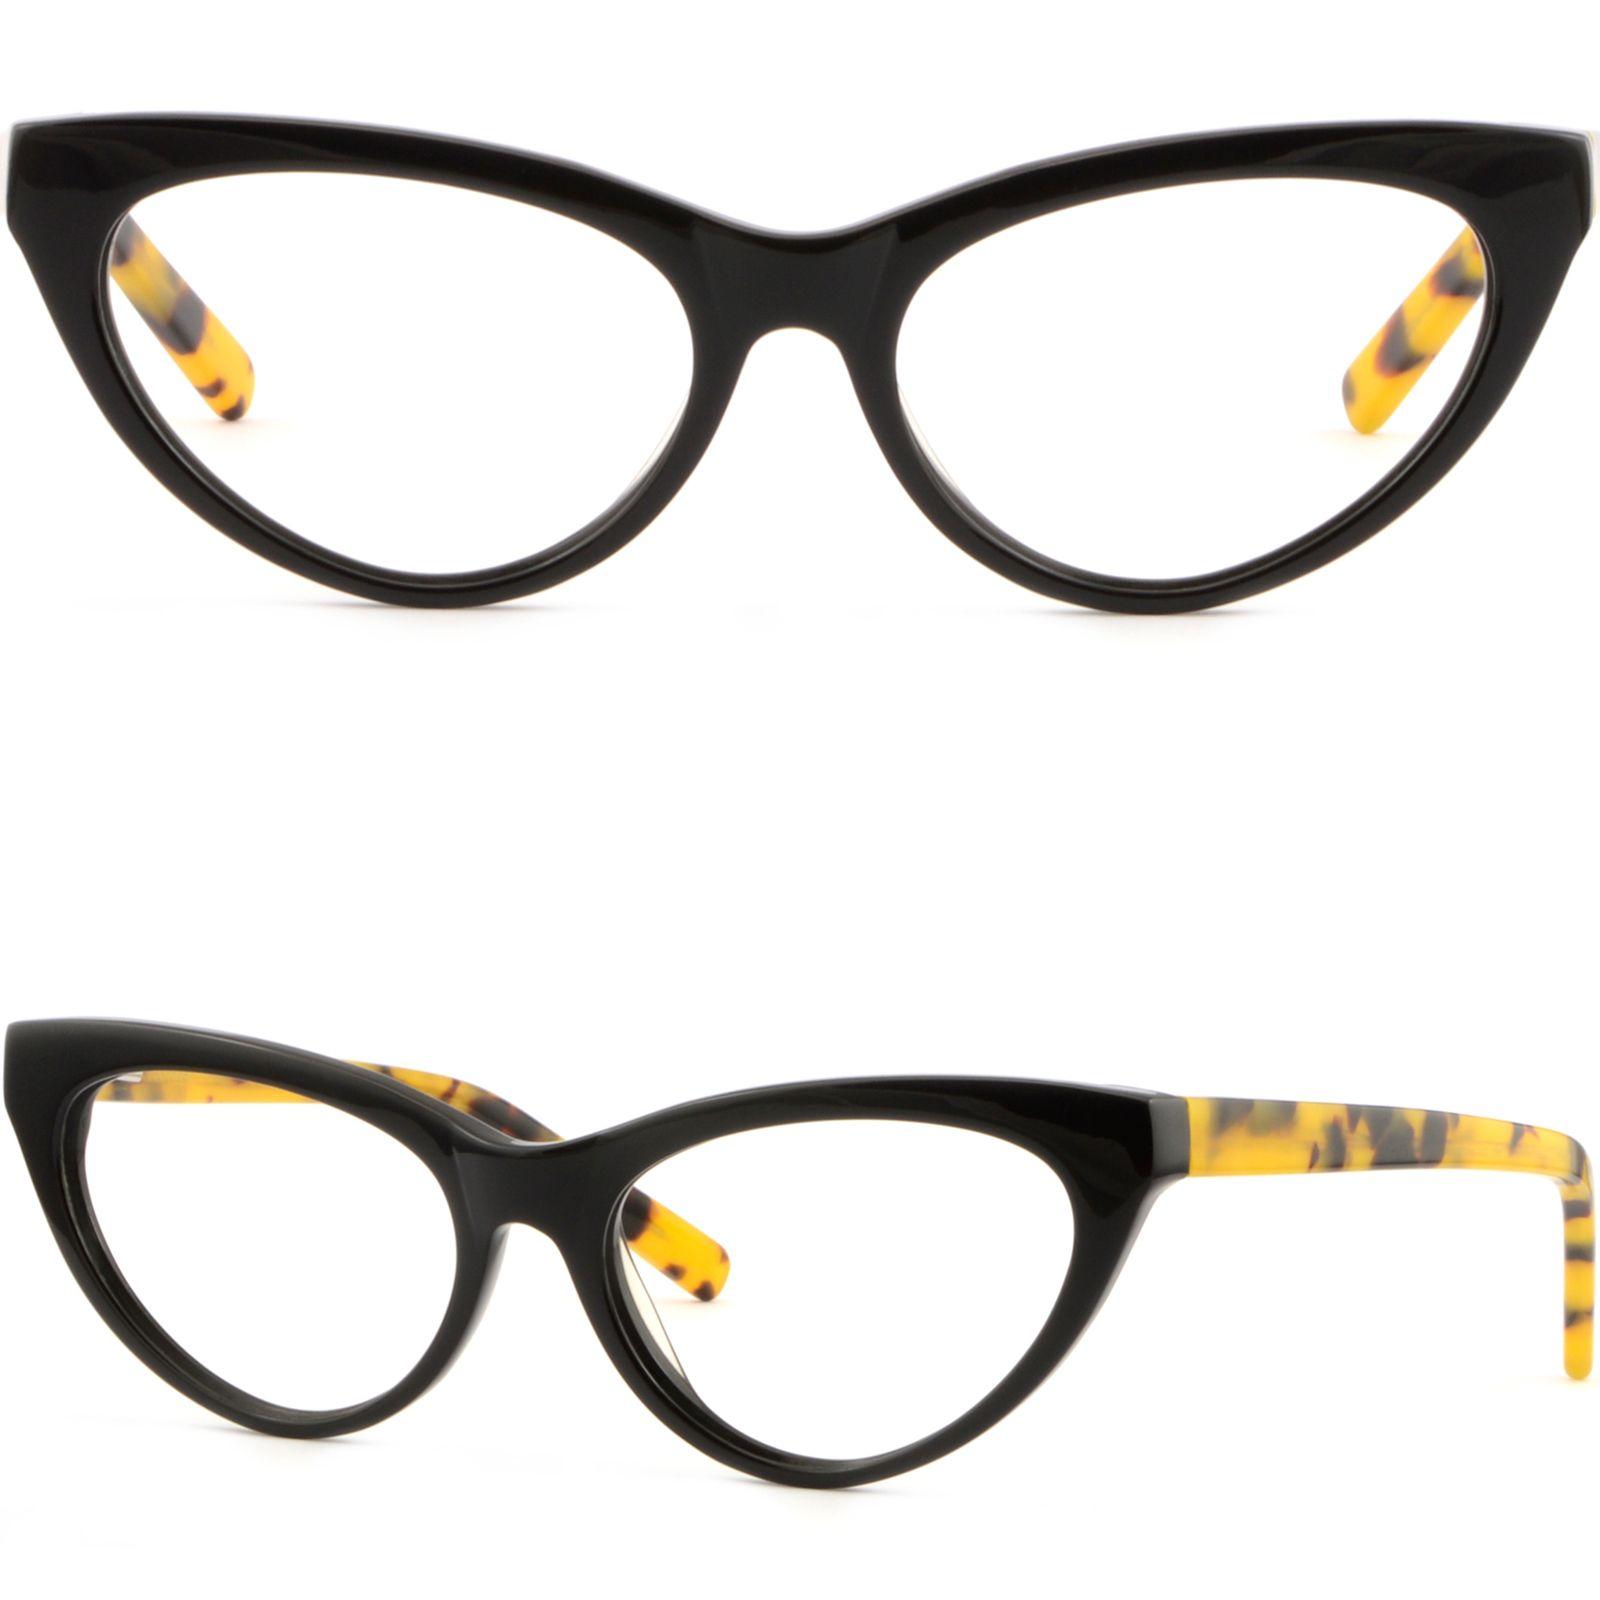 be76d2d08f6 Acetate Plastic Cat Eye Women Cateye Black Frame Prescription Glasses Spring  Arm Luxury Eyeglass Frames Mens Fashion Eyeglass Frames From Aceglasses